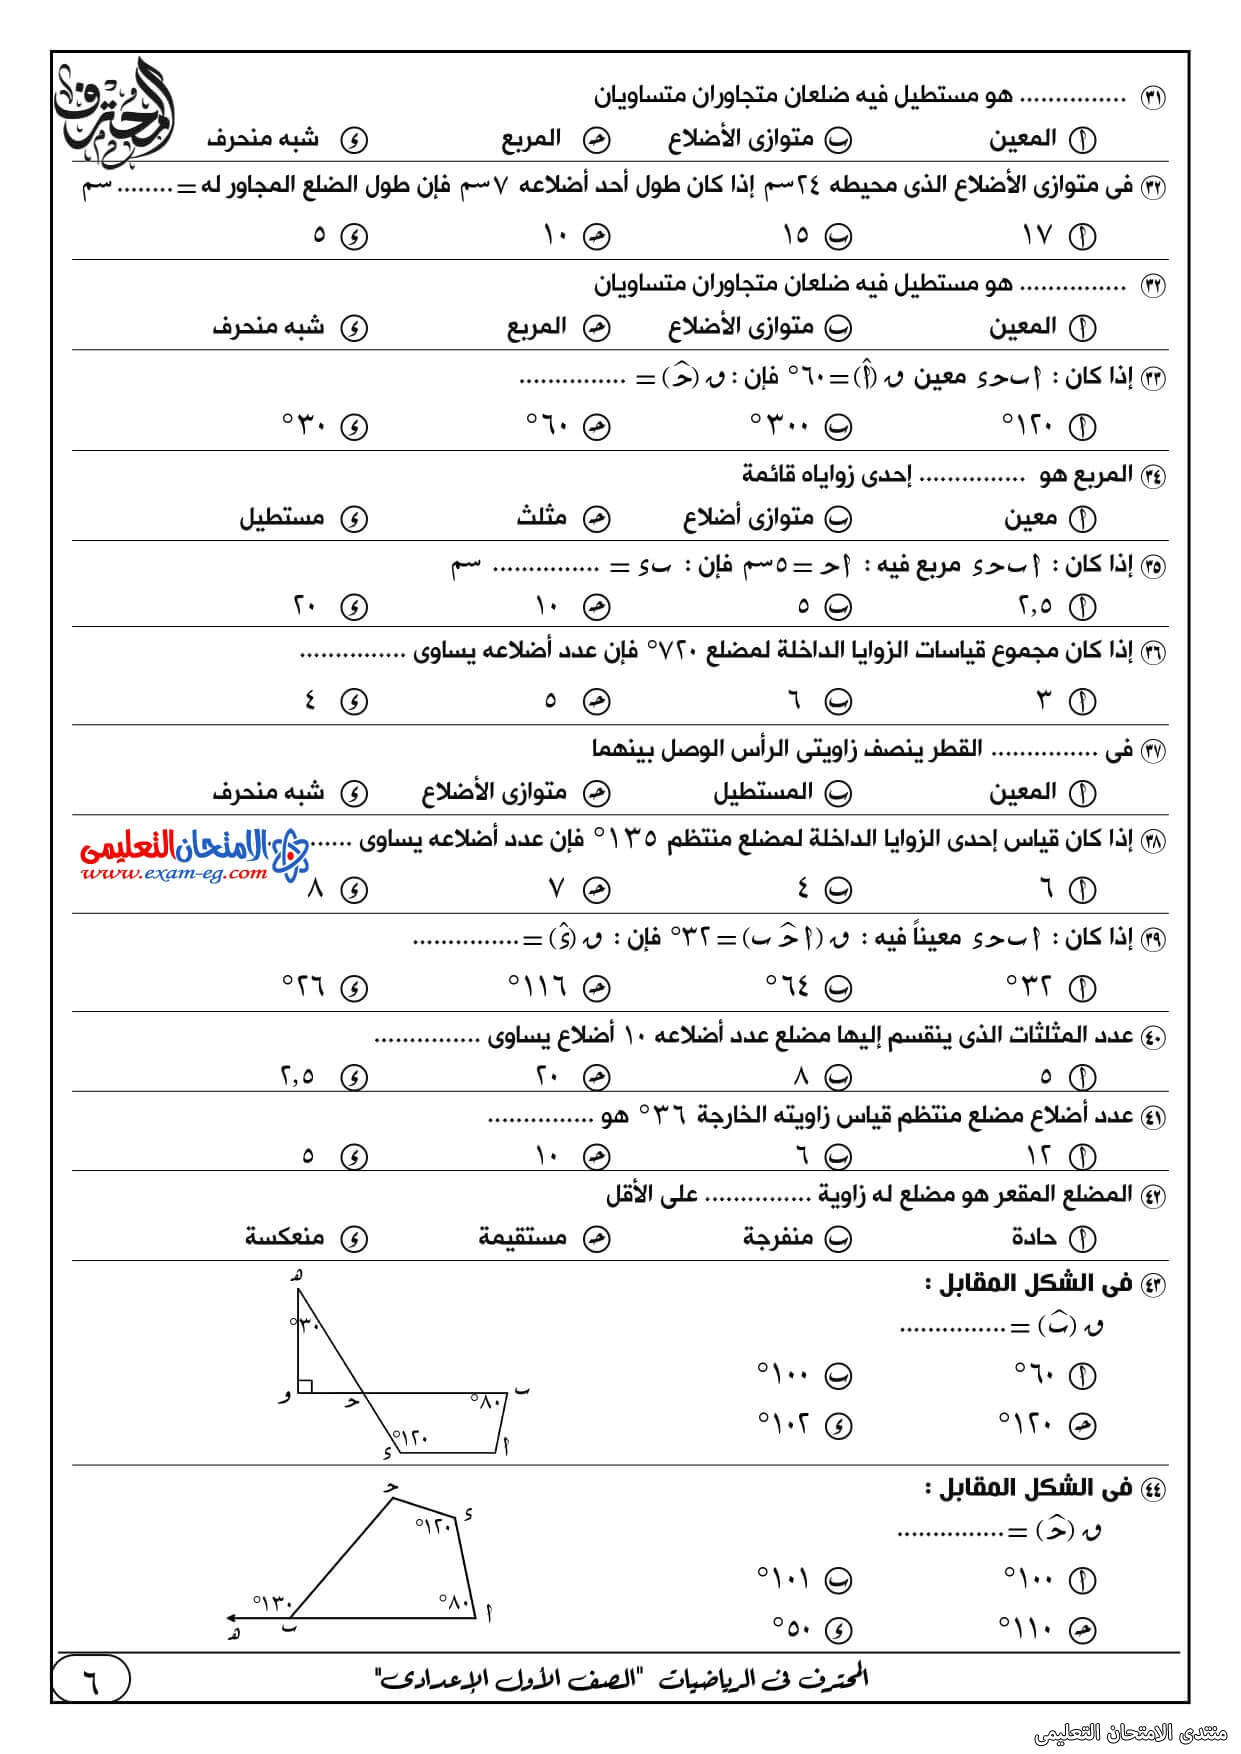 exam-eg.com_161688555037757.jpg